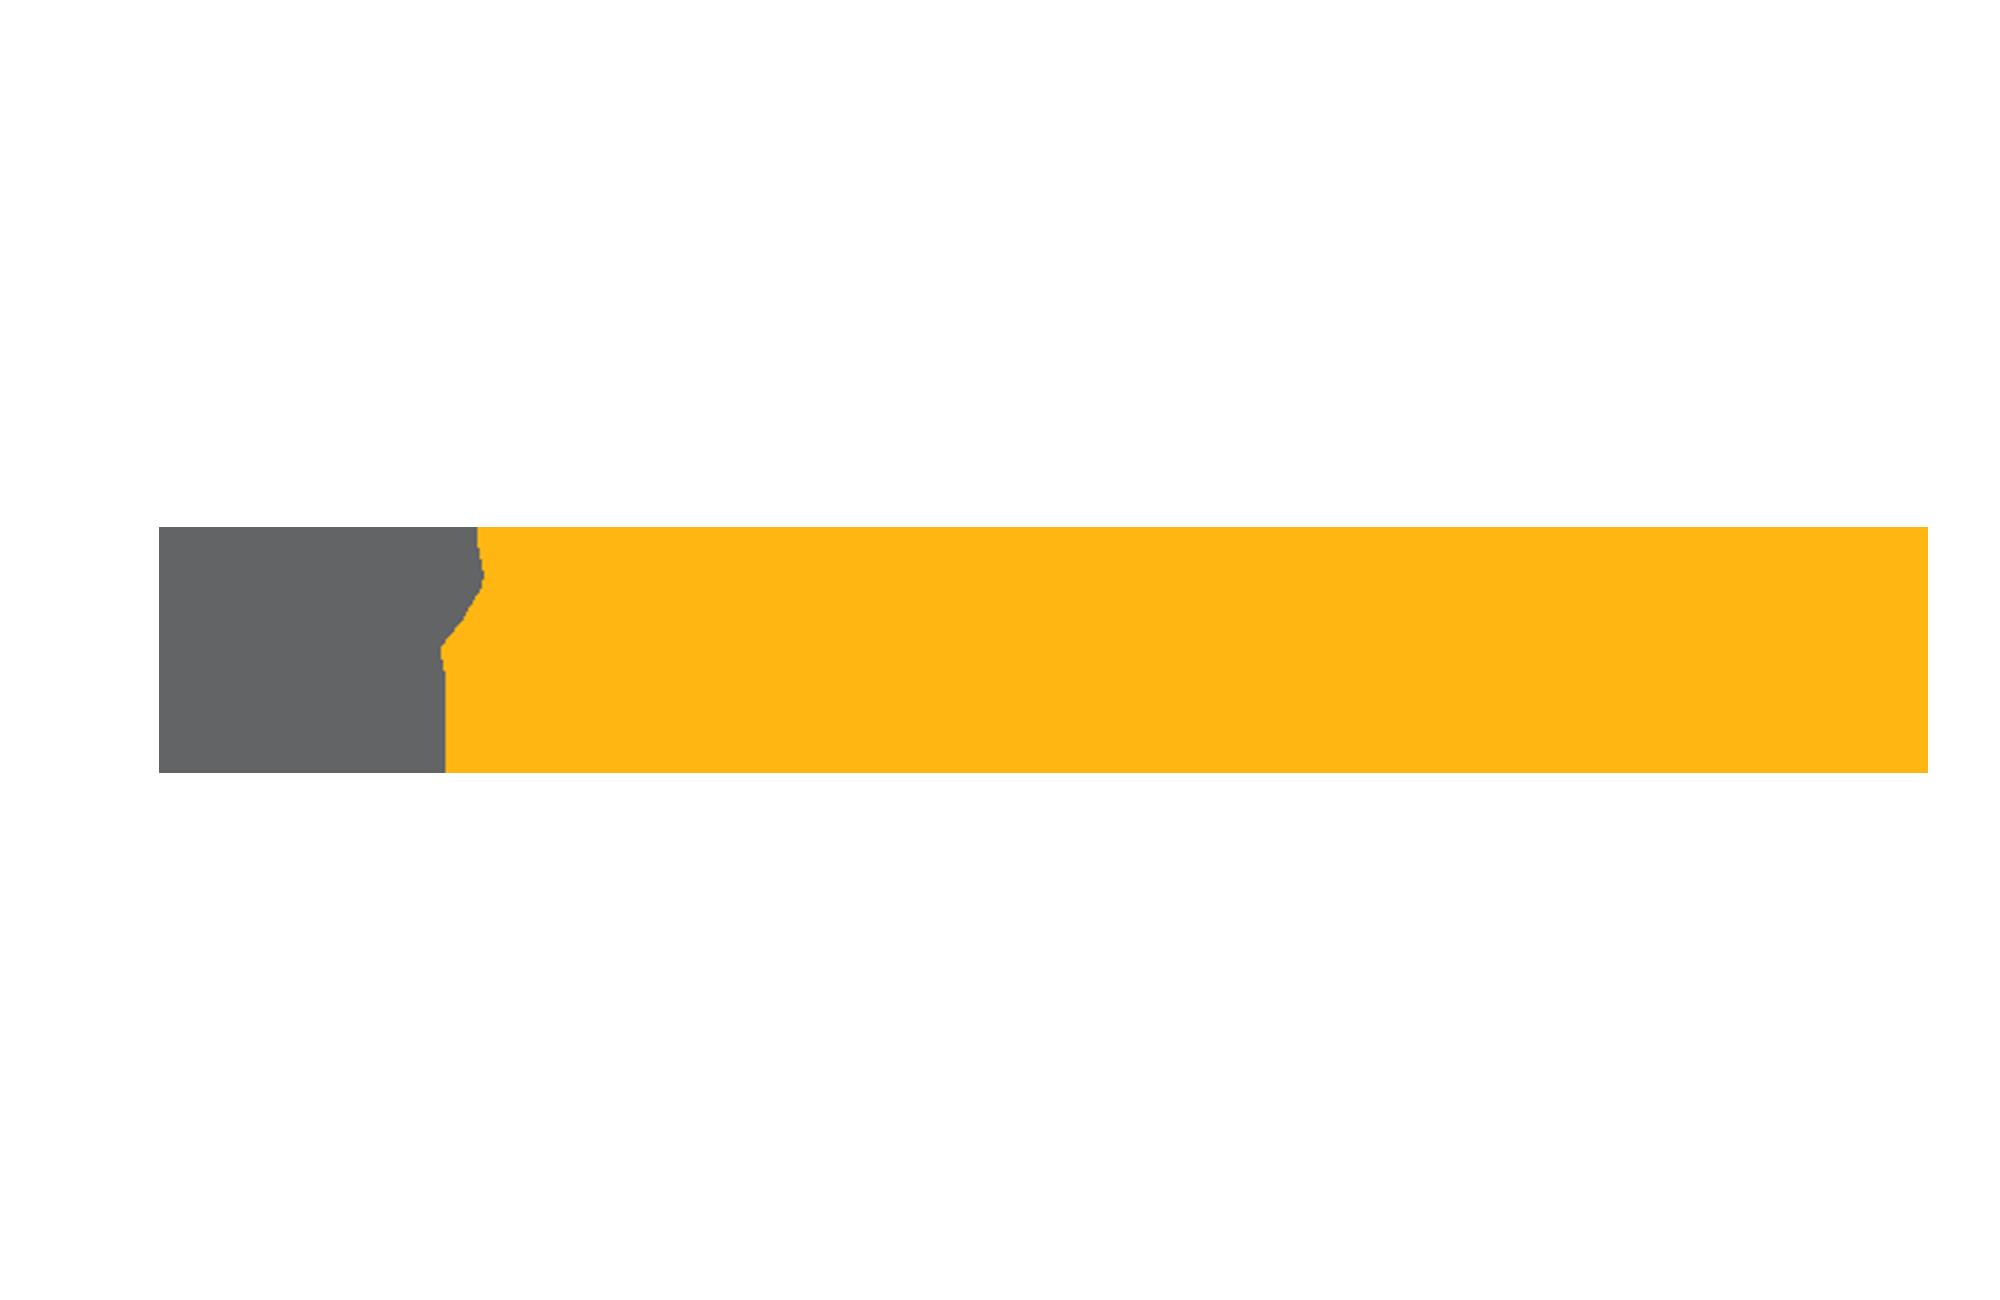 AEFCM